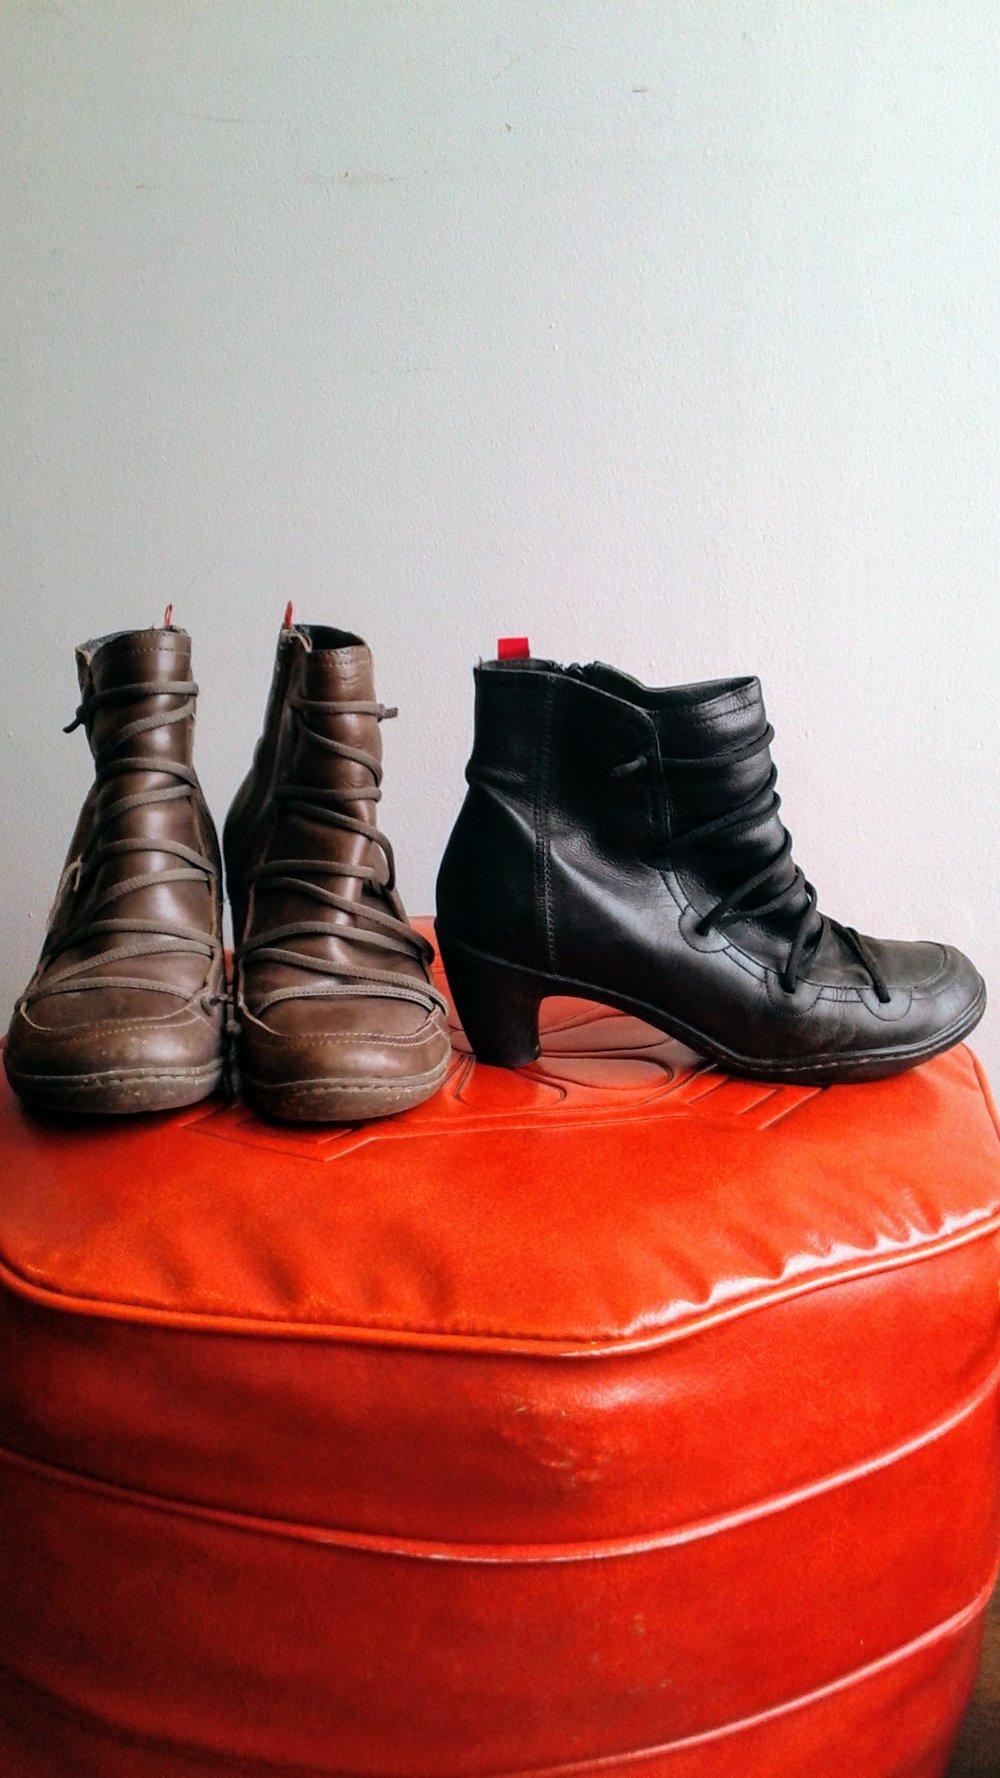 Brown Camper boots; S6.5, $46. Black Camper boots; S6, $38